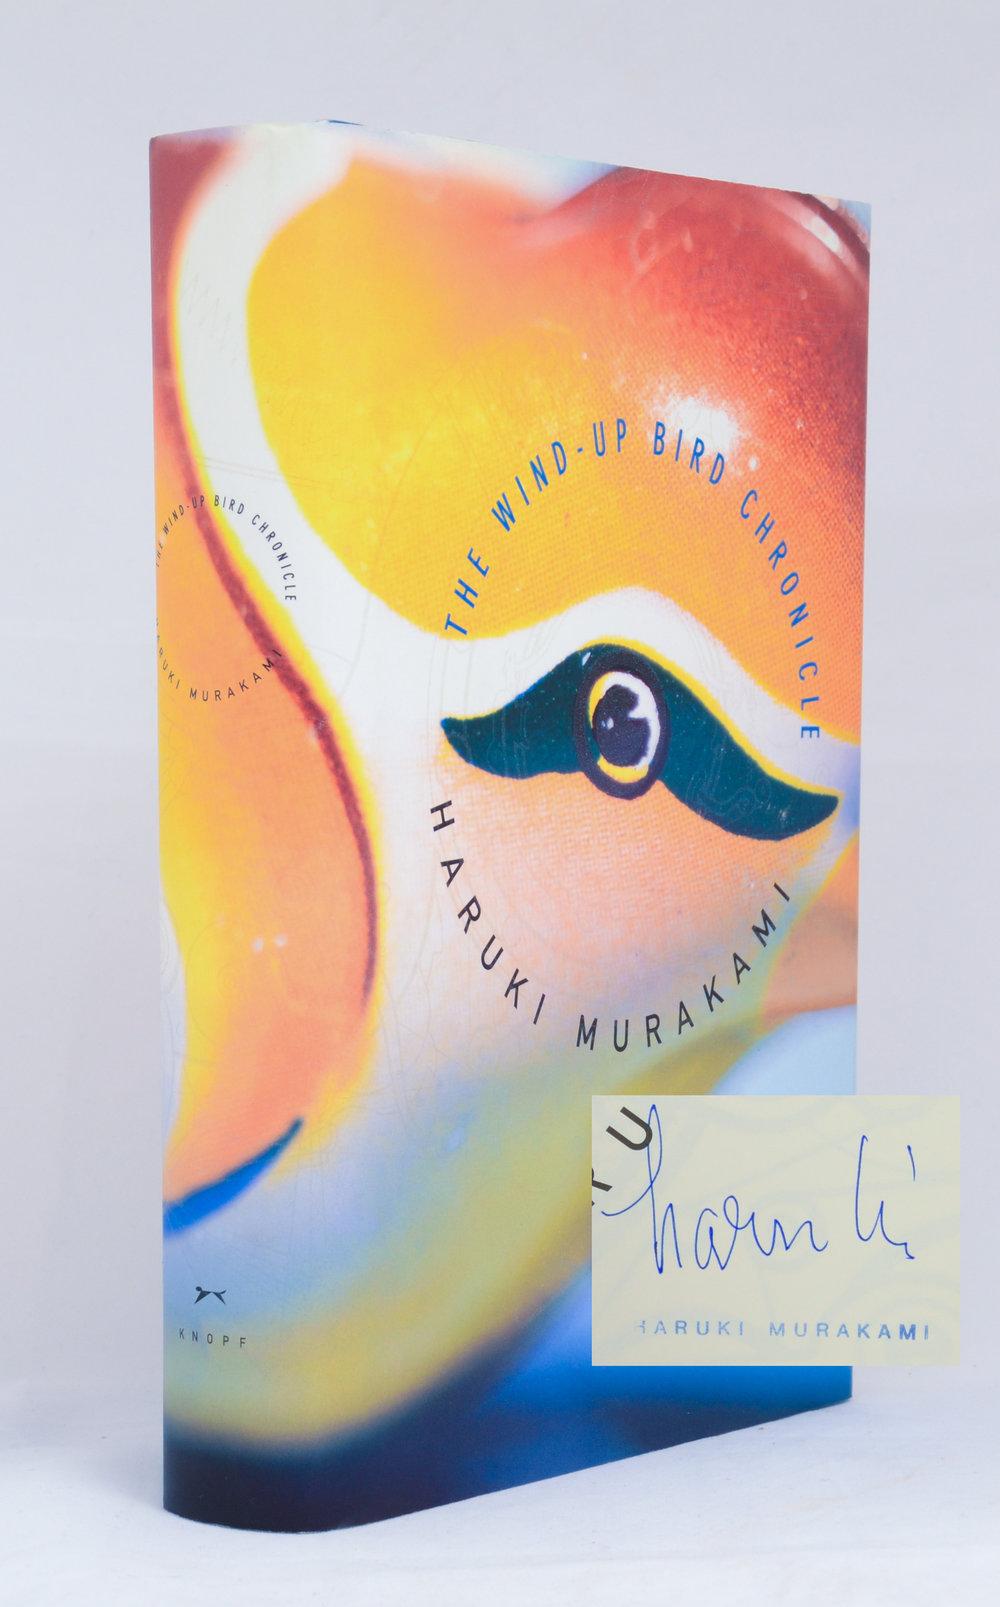 Murakami. Wind-Up Bird Chronicle. Signed